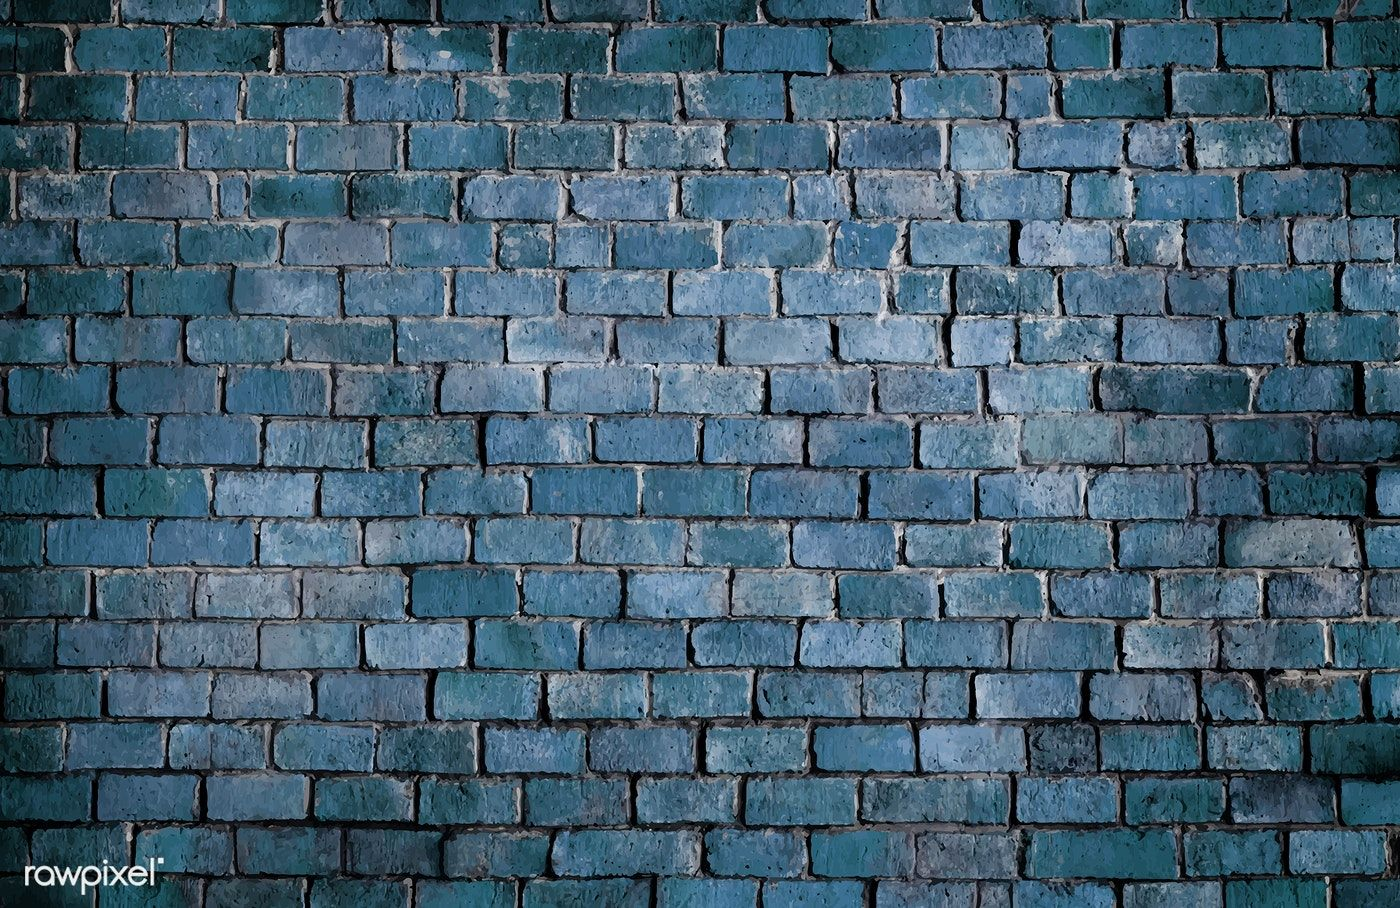 Blue Textured Brick Wall Background Free Image By Rawpixel Com Brick Wall Background Brick Wall Backdrop Brick Wall